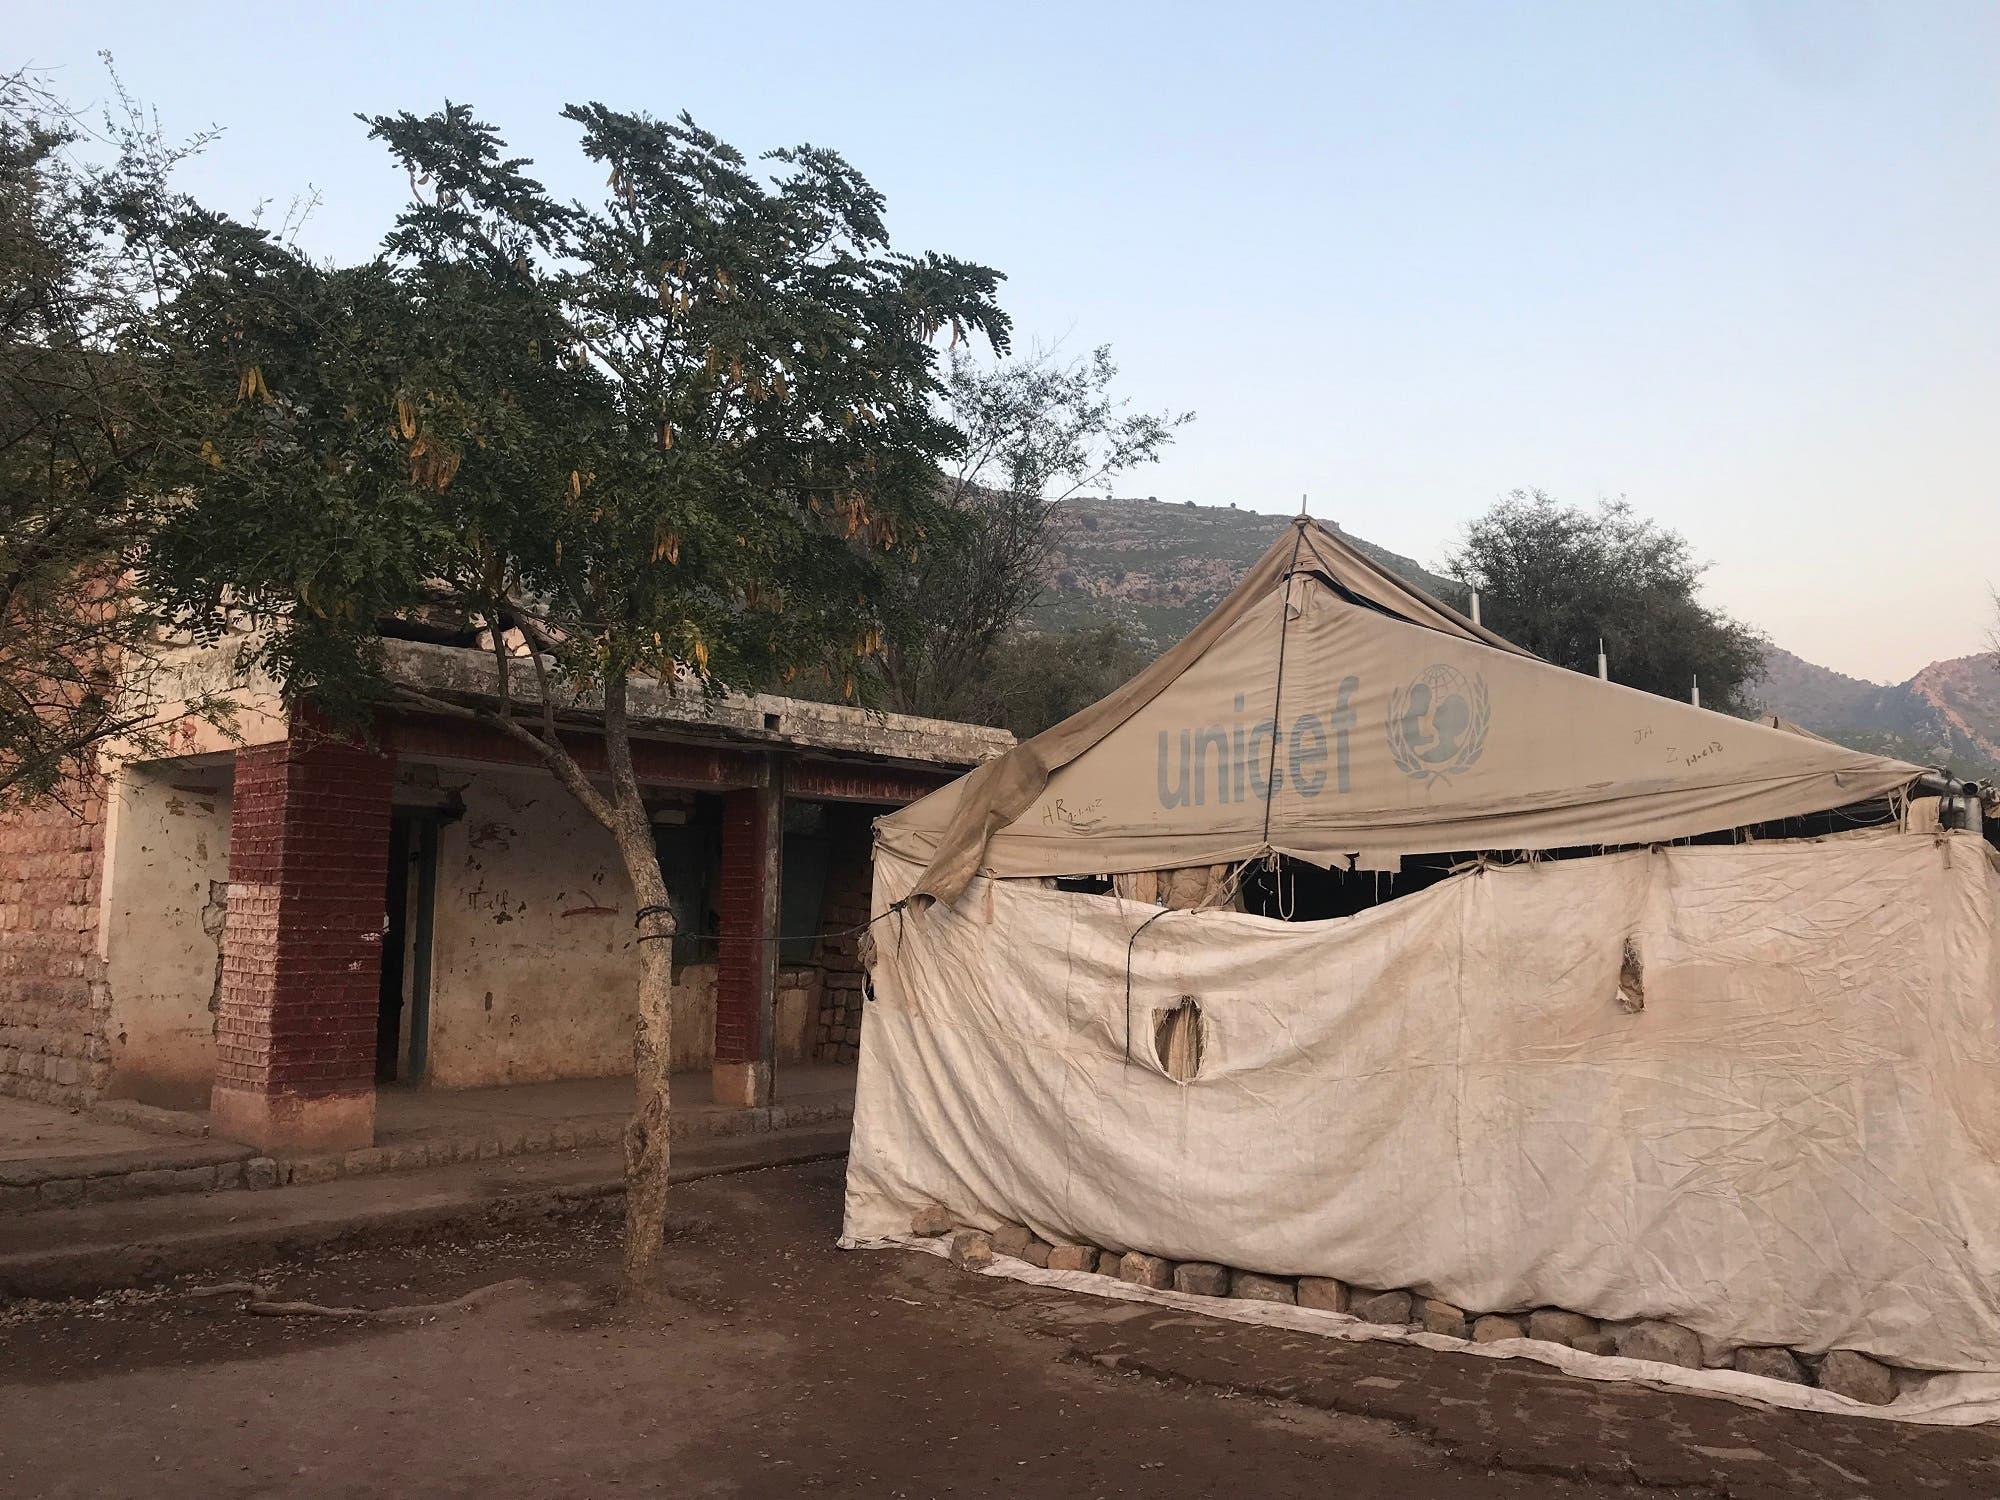 Darra Adam Khel tent school, blown up by militants in 2009. (Supplied)